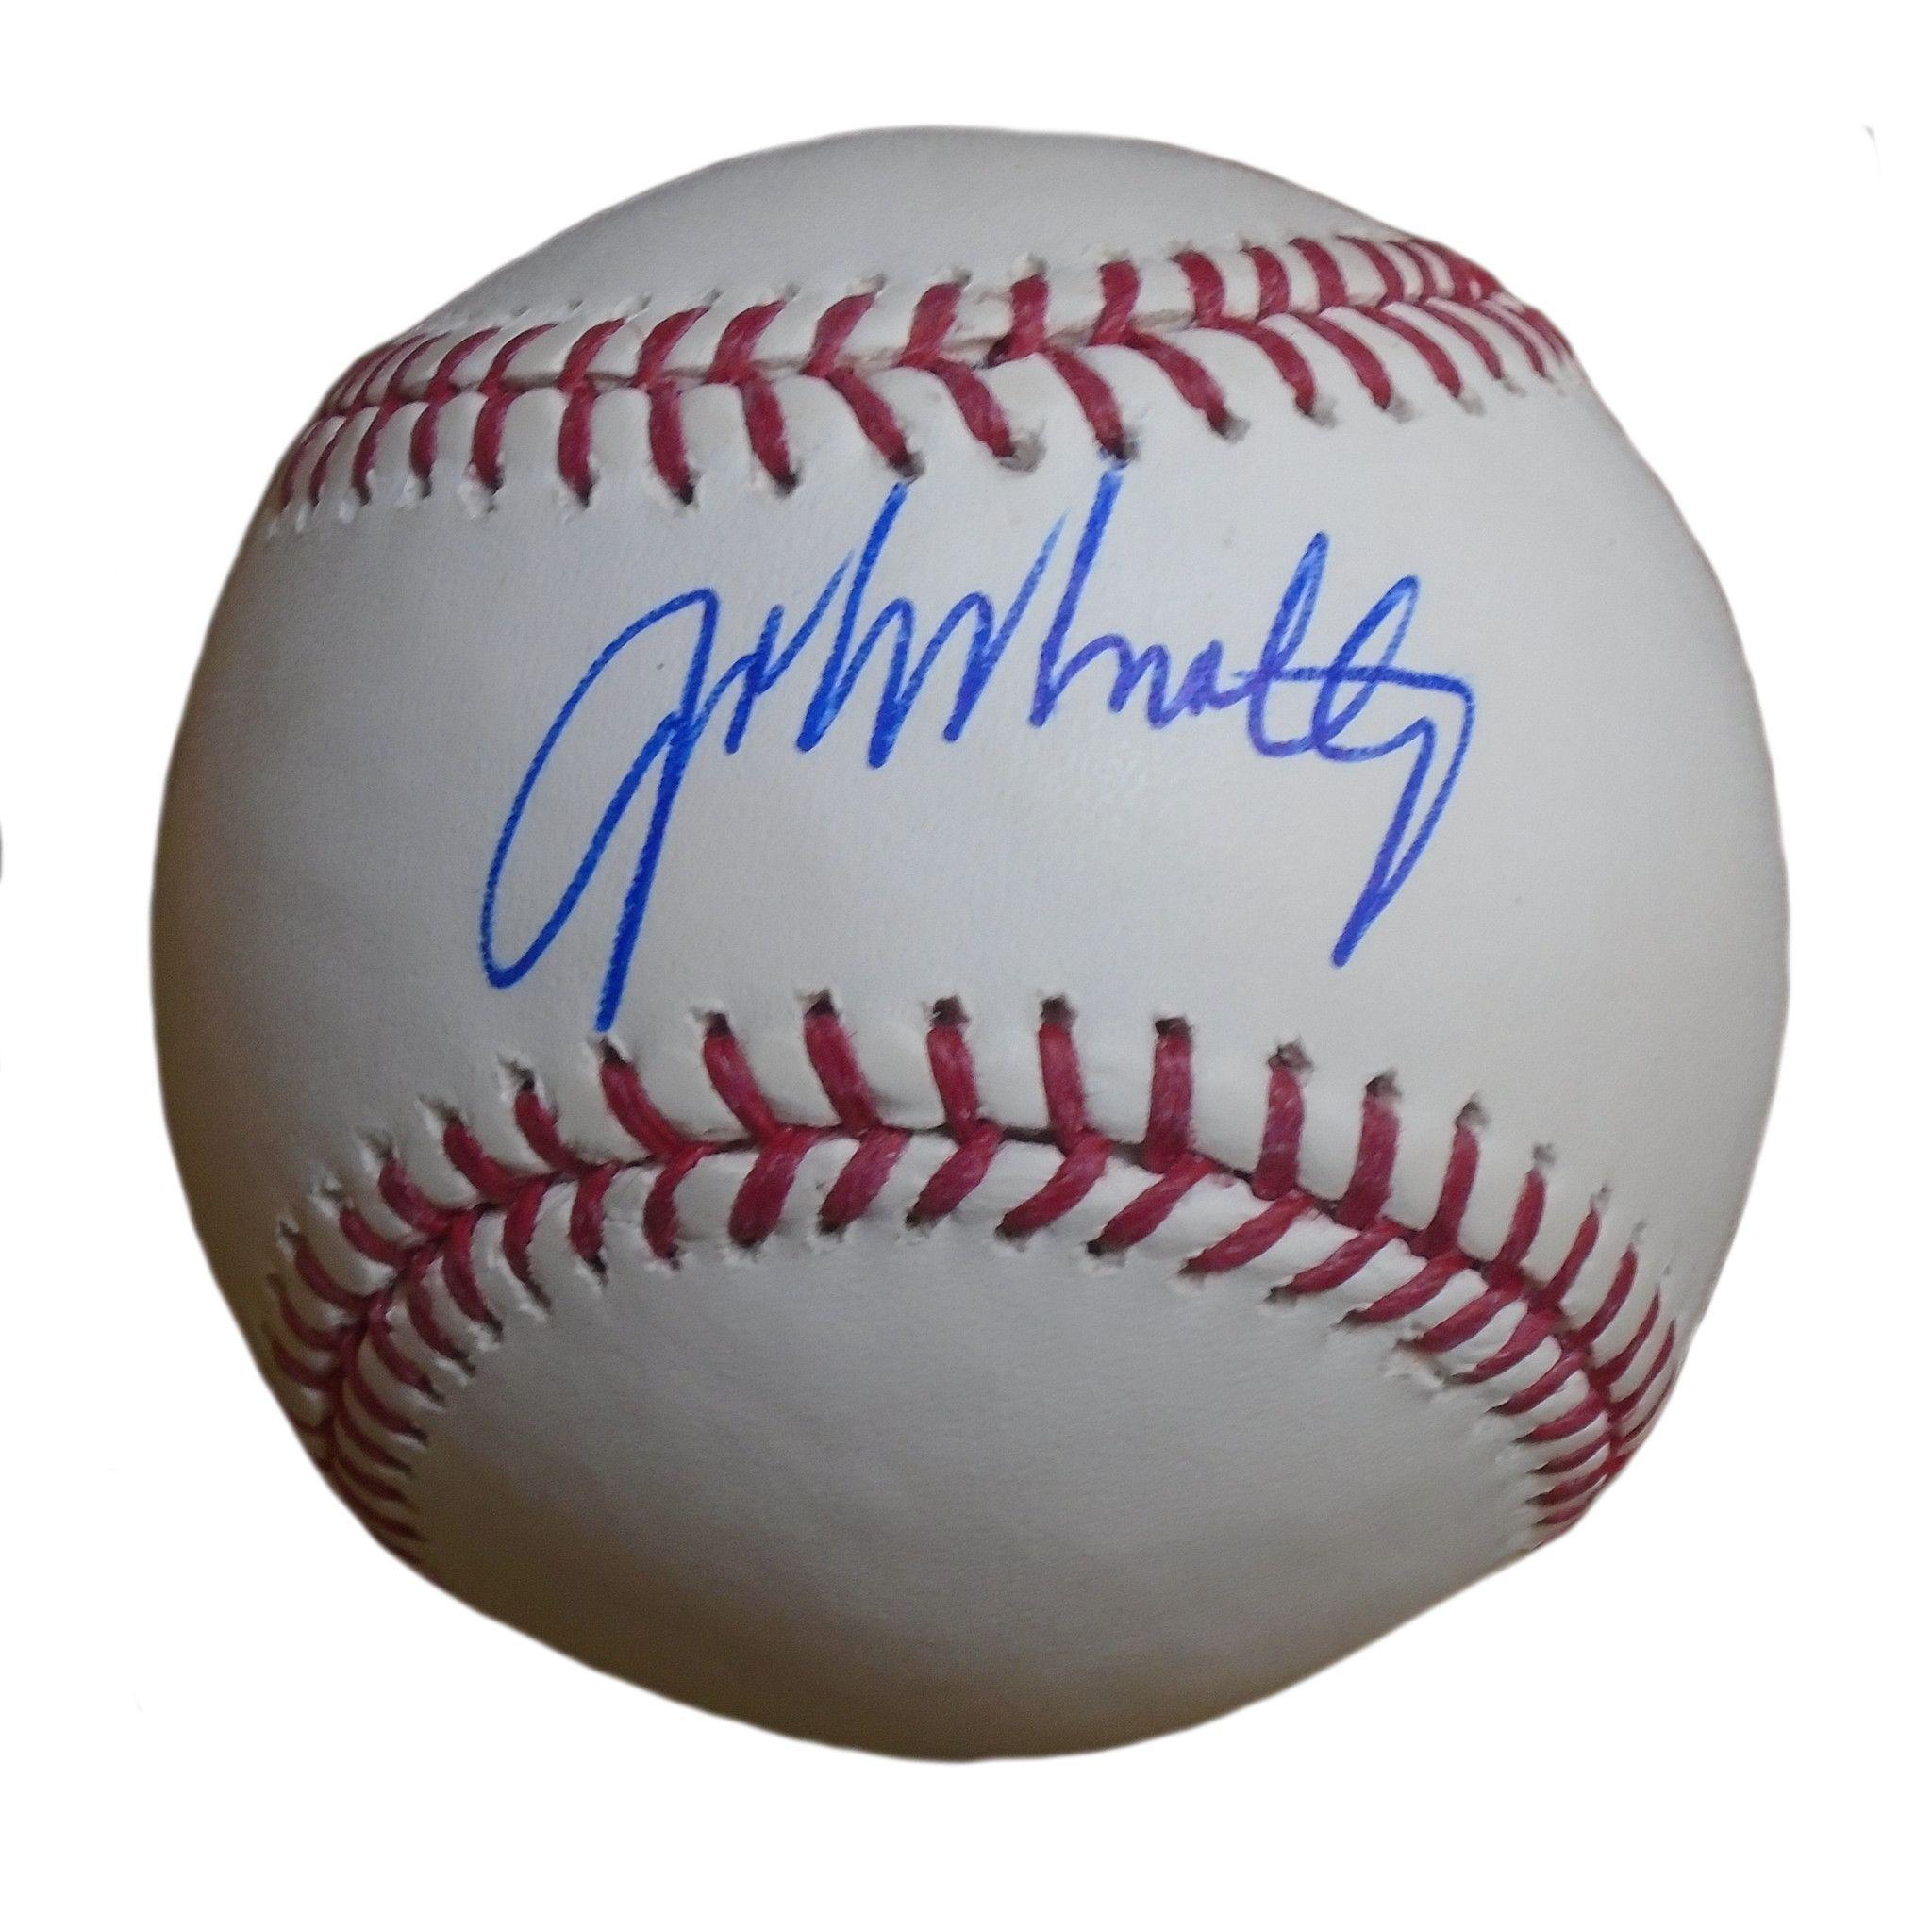 John Smoltz Autographed Rawlings Romlb Baseball Proof Photo Basketball T Shirt Designs Braves Baseball Braves